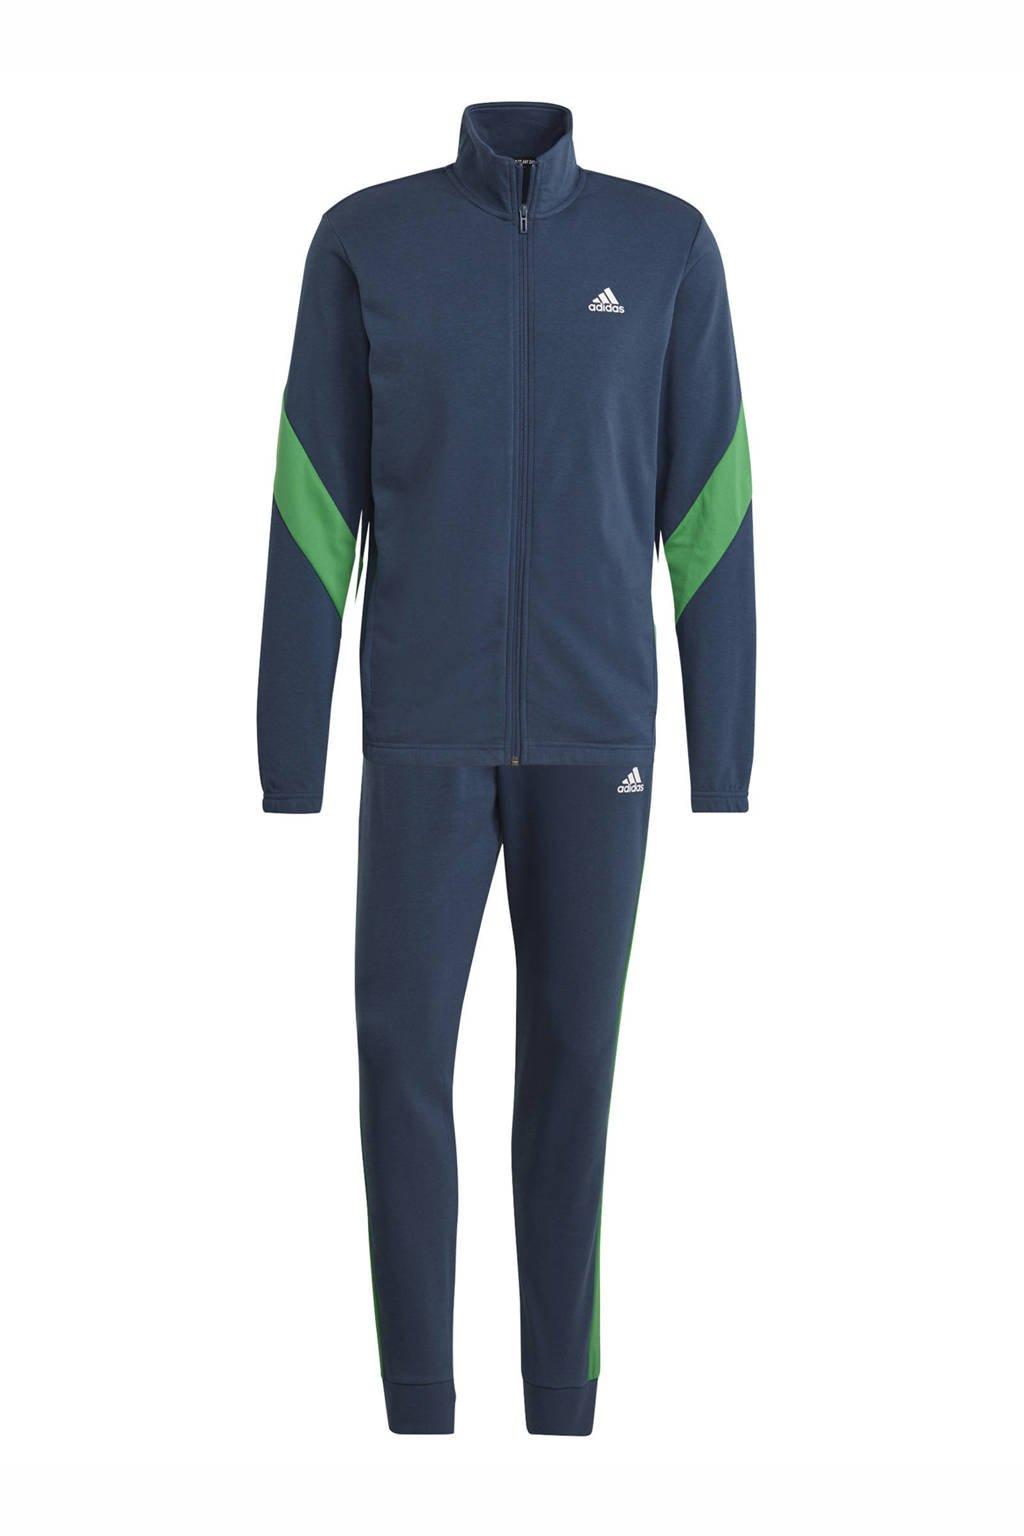 adidas Performance   trainingspak donkerblauw/groen, Donkerblauw/groen